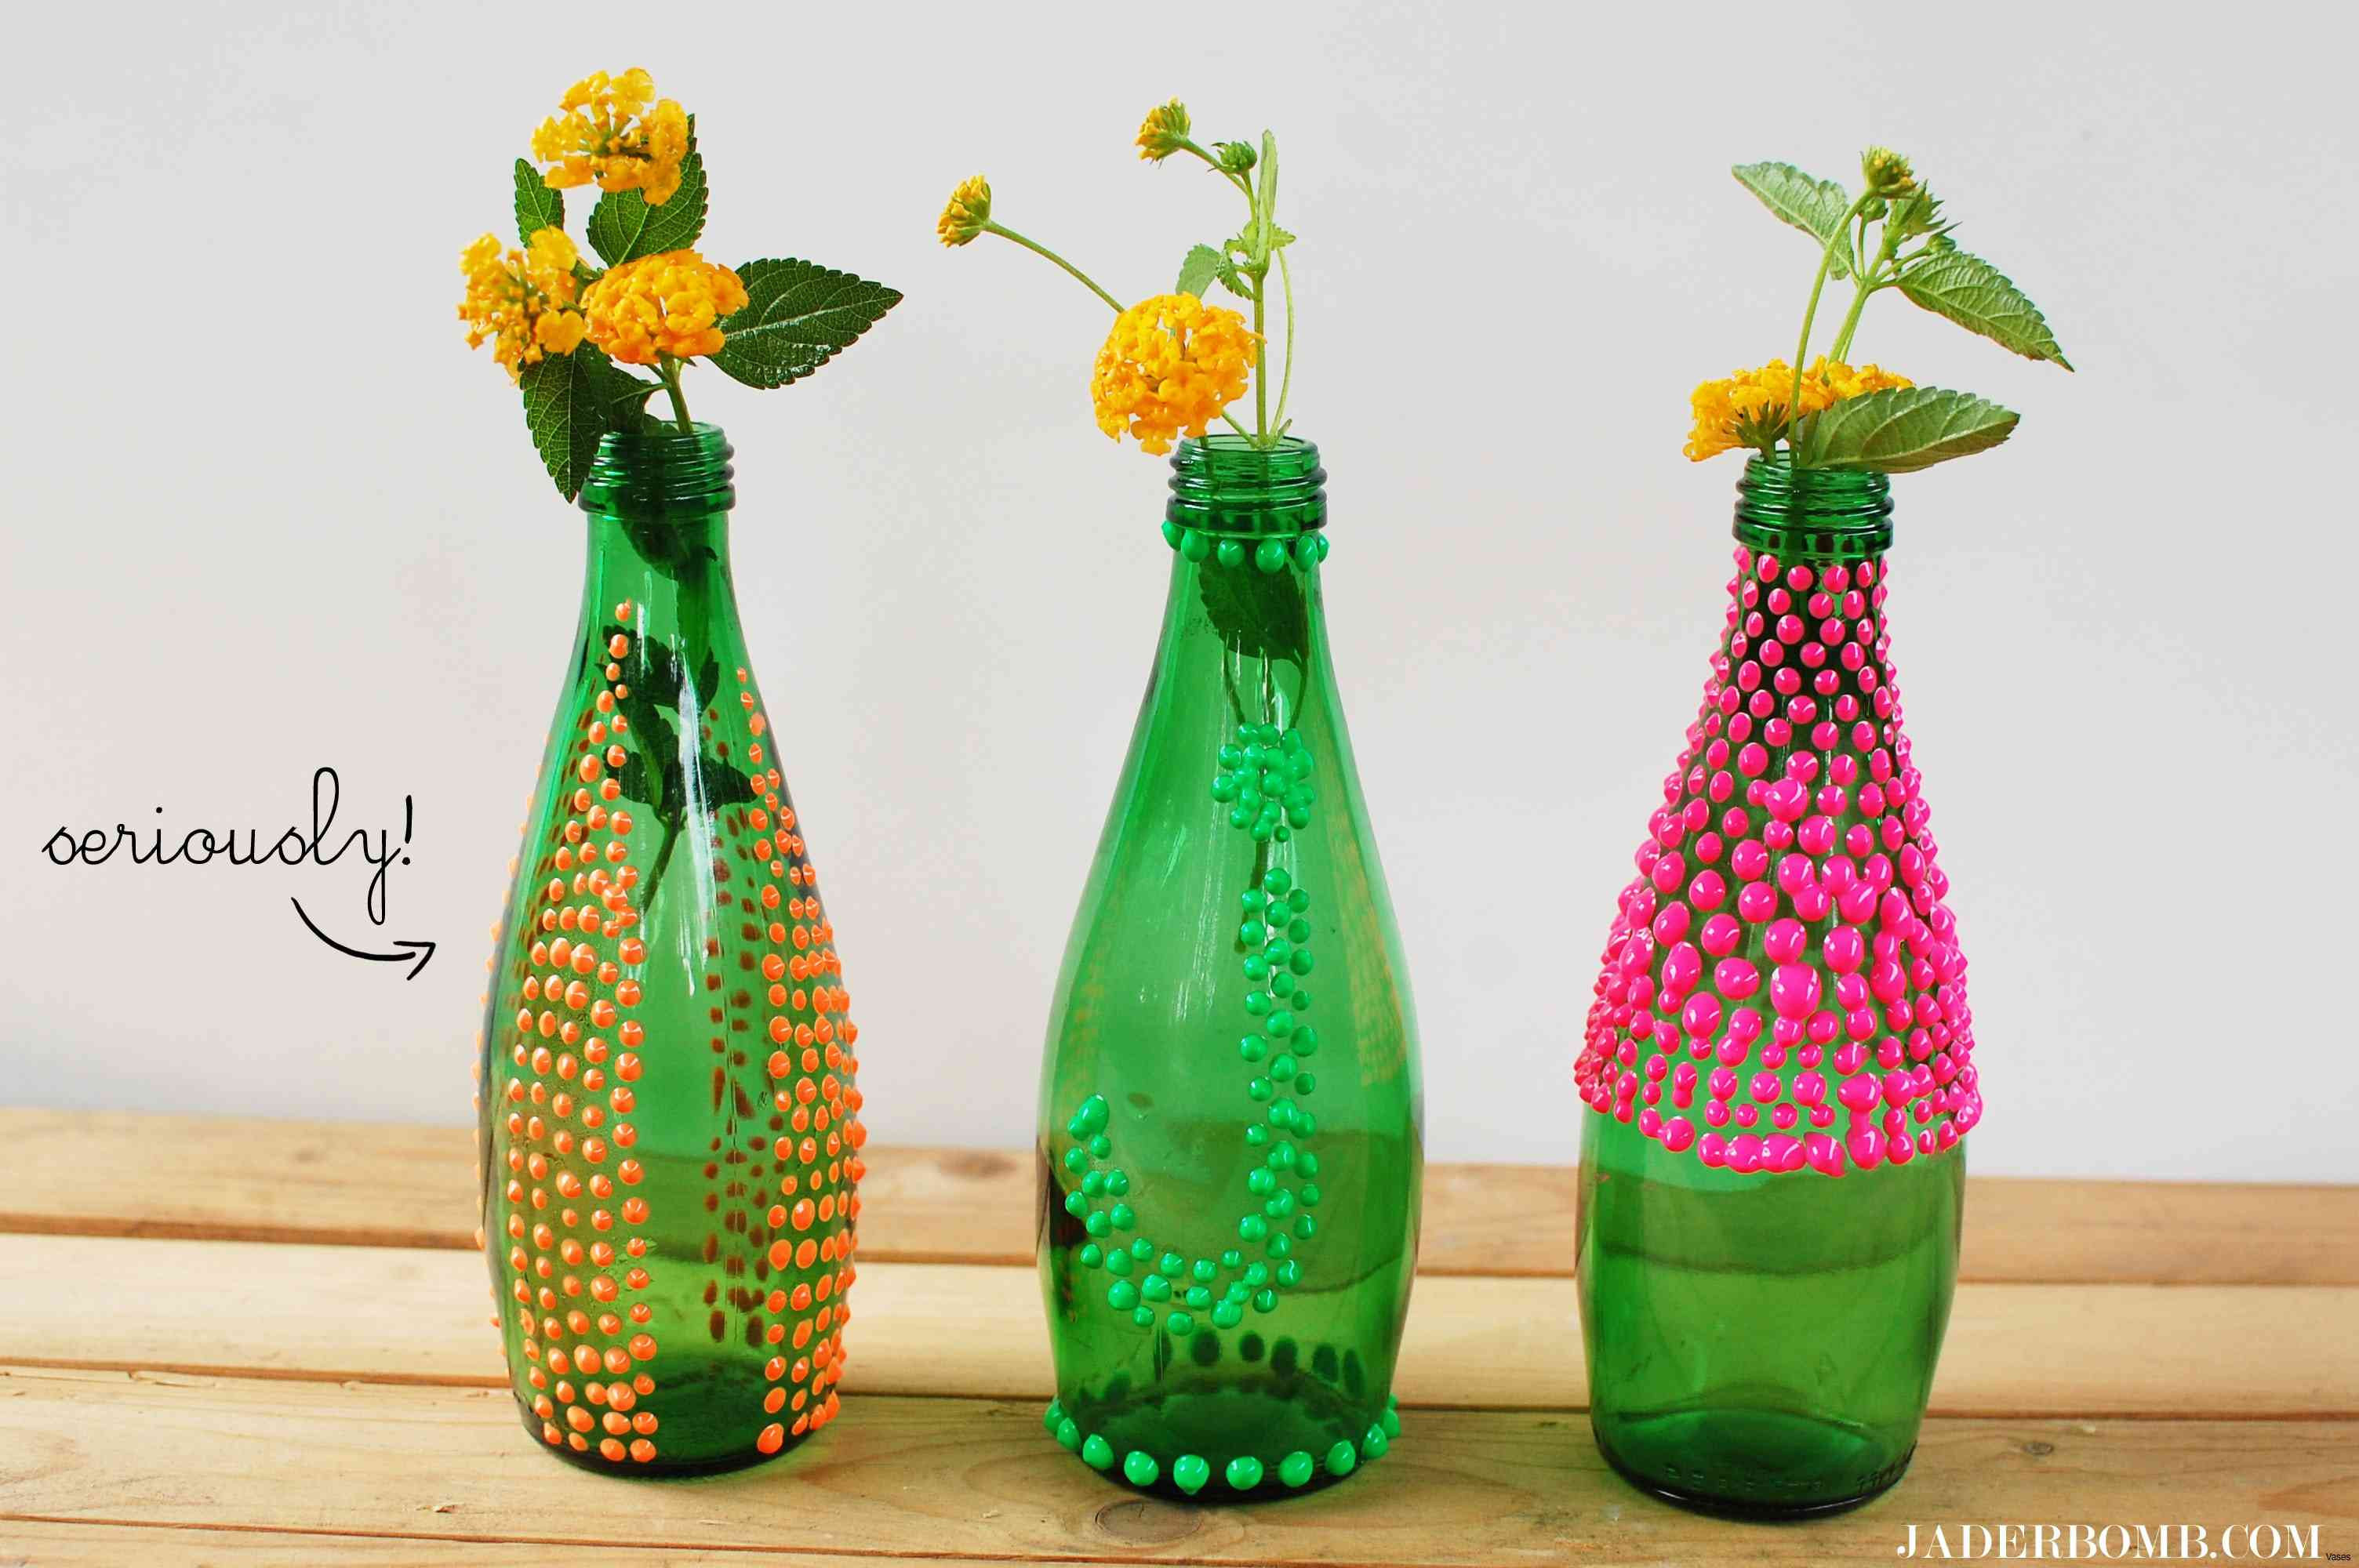 Wholesale Floor Vases Of Wide Glass Vase Image Paint A Picture Luxury H Vases Paint Vase I 0d Throughout Wide Glass Vase Image Paint A Picture Luxury H Vases Paint Vase I 0d with Glue